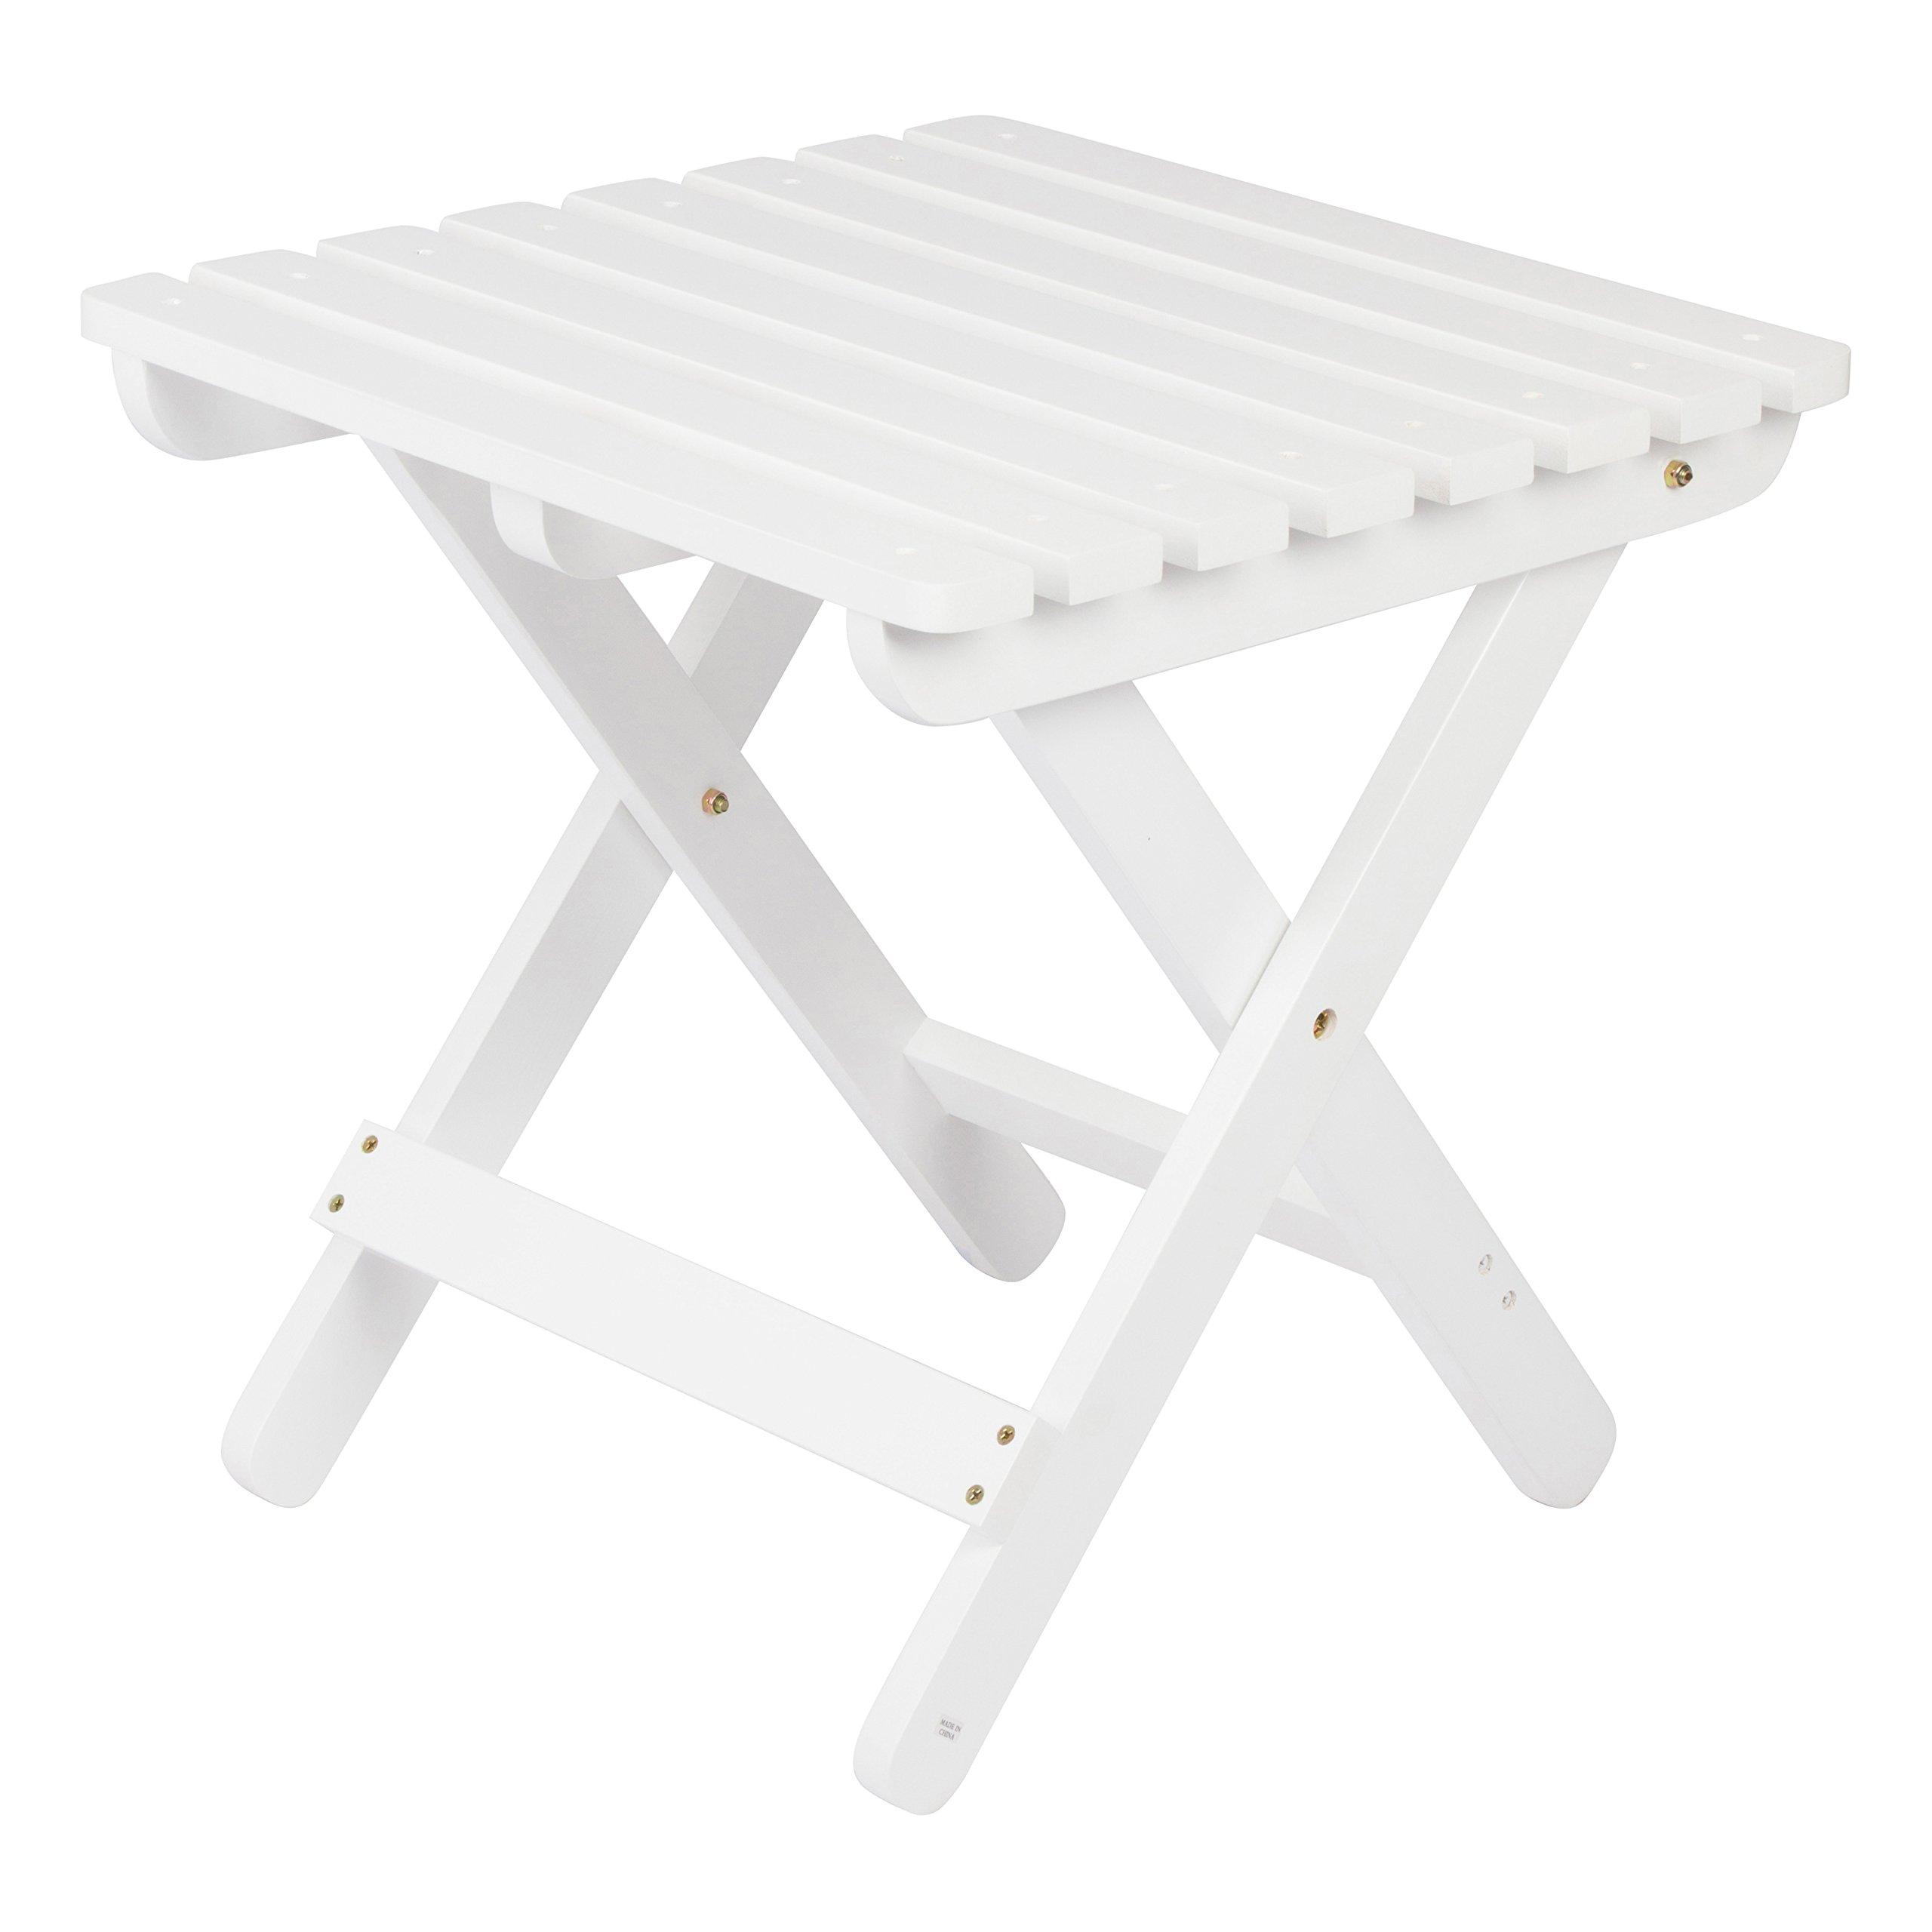 Shine Company 4109WT Adirondack Square Folding Table, White by Shine Company